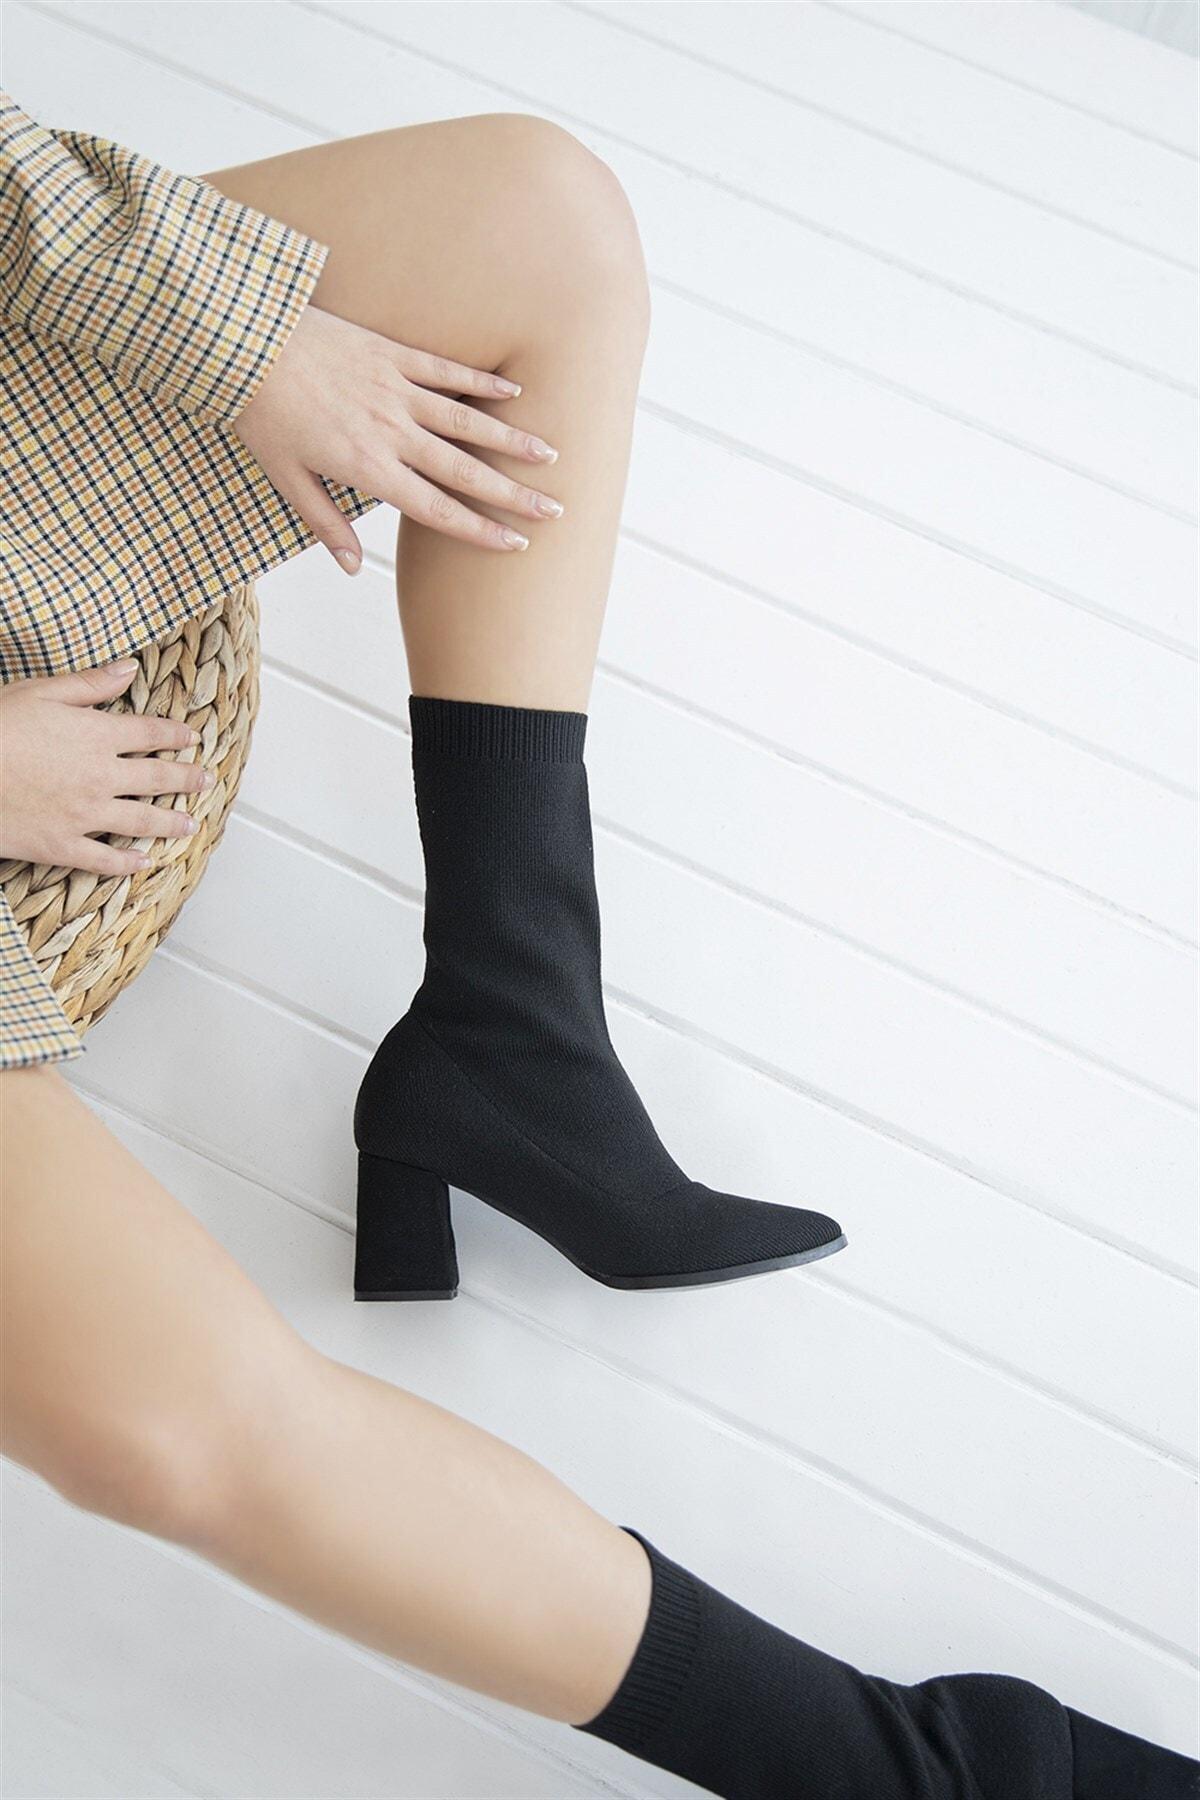 STRASWANS Foster Kadın Topuklu Streç Triko Bot Siyah 2